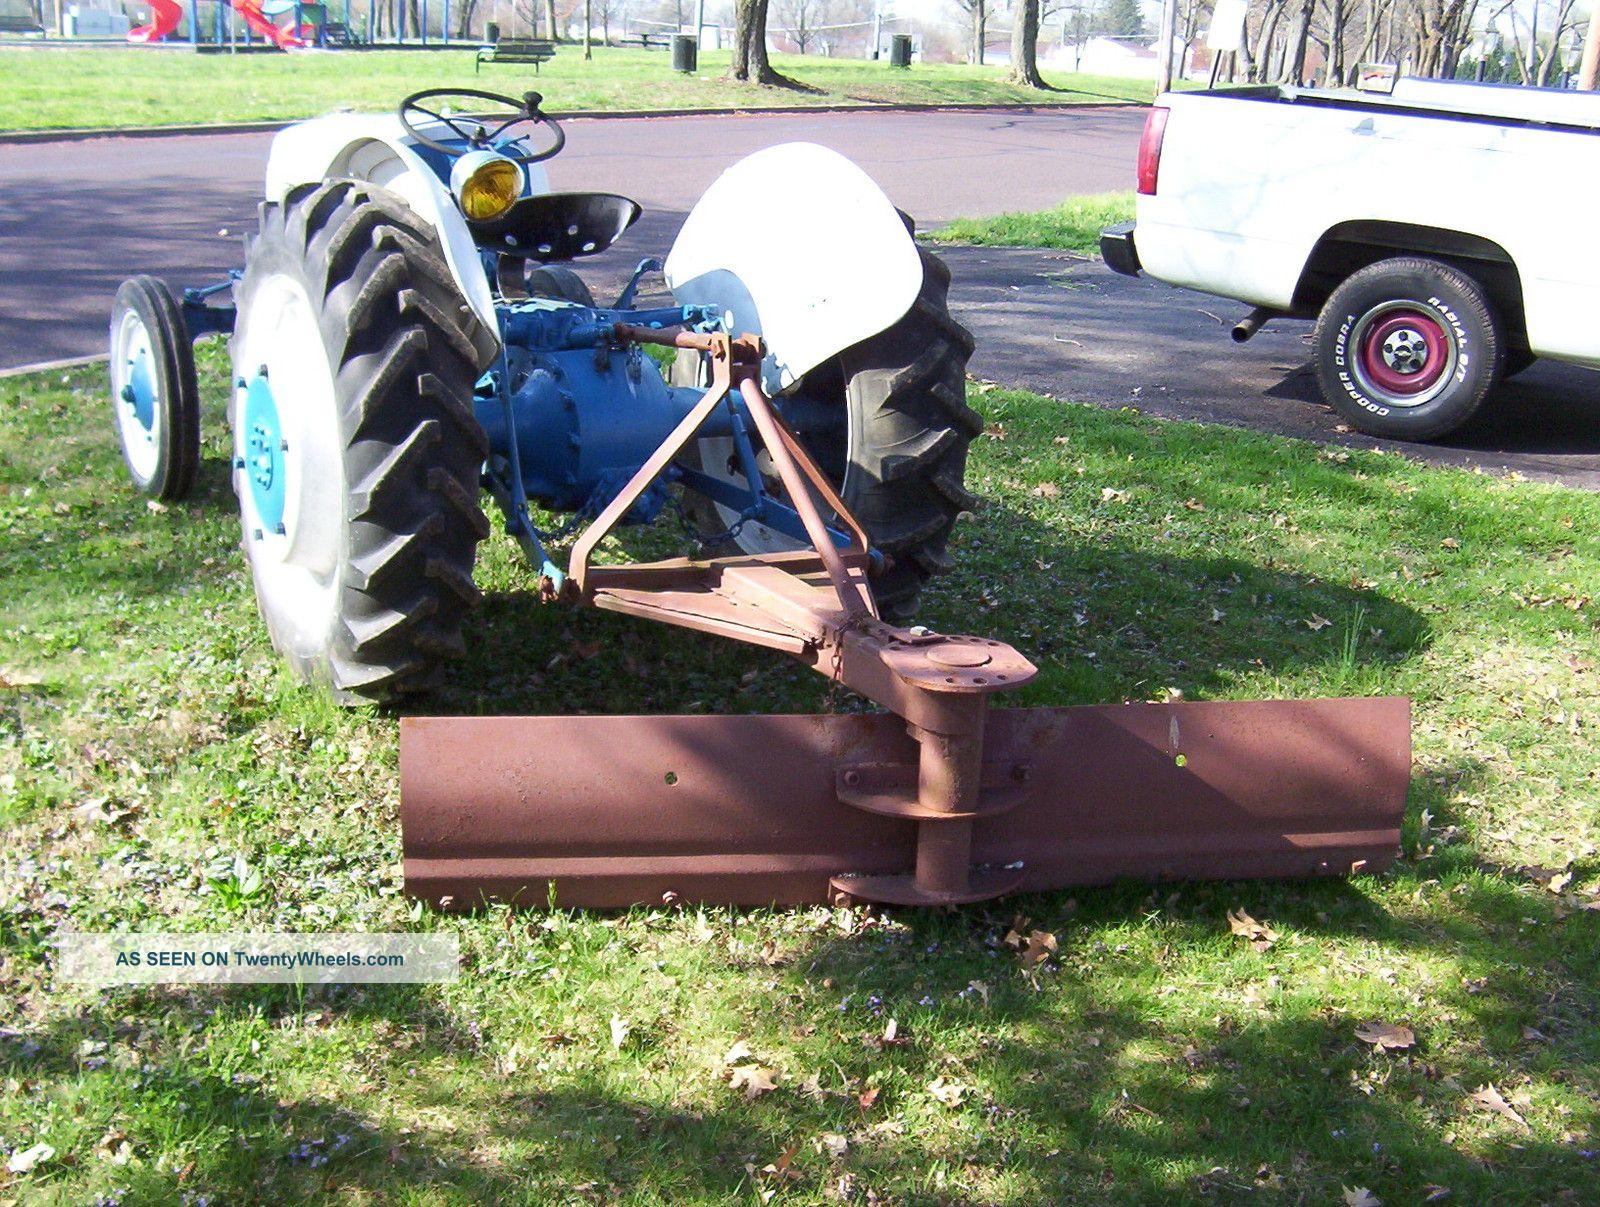 1940 Ford 9n Wiring Diagram Automotive 1941 Tractor International Farm Engine Bobcat Diagrams Harness